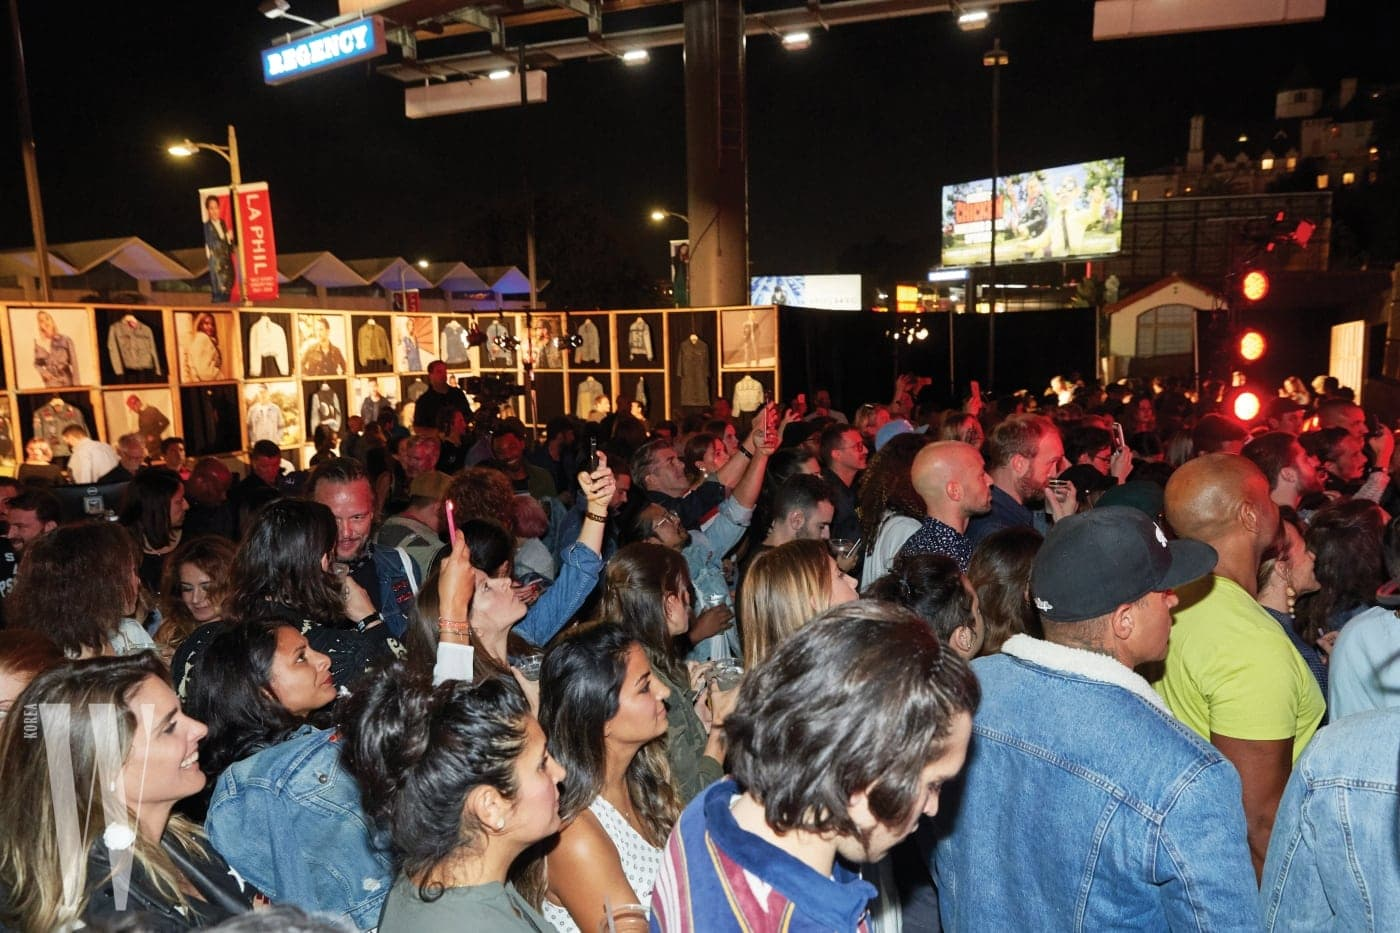 LA의 도로에서 열린 리바이스의 트러커 50주년 행사는 수많은 셀레브리티와 인파 속에 성공적으로 마무리됐다.